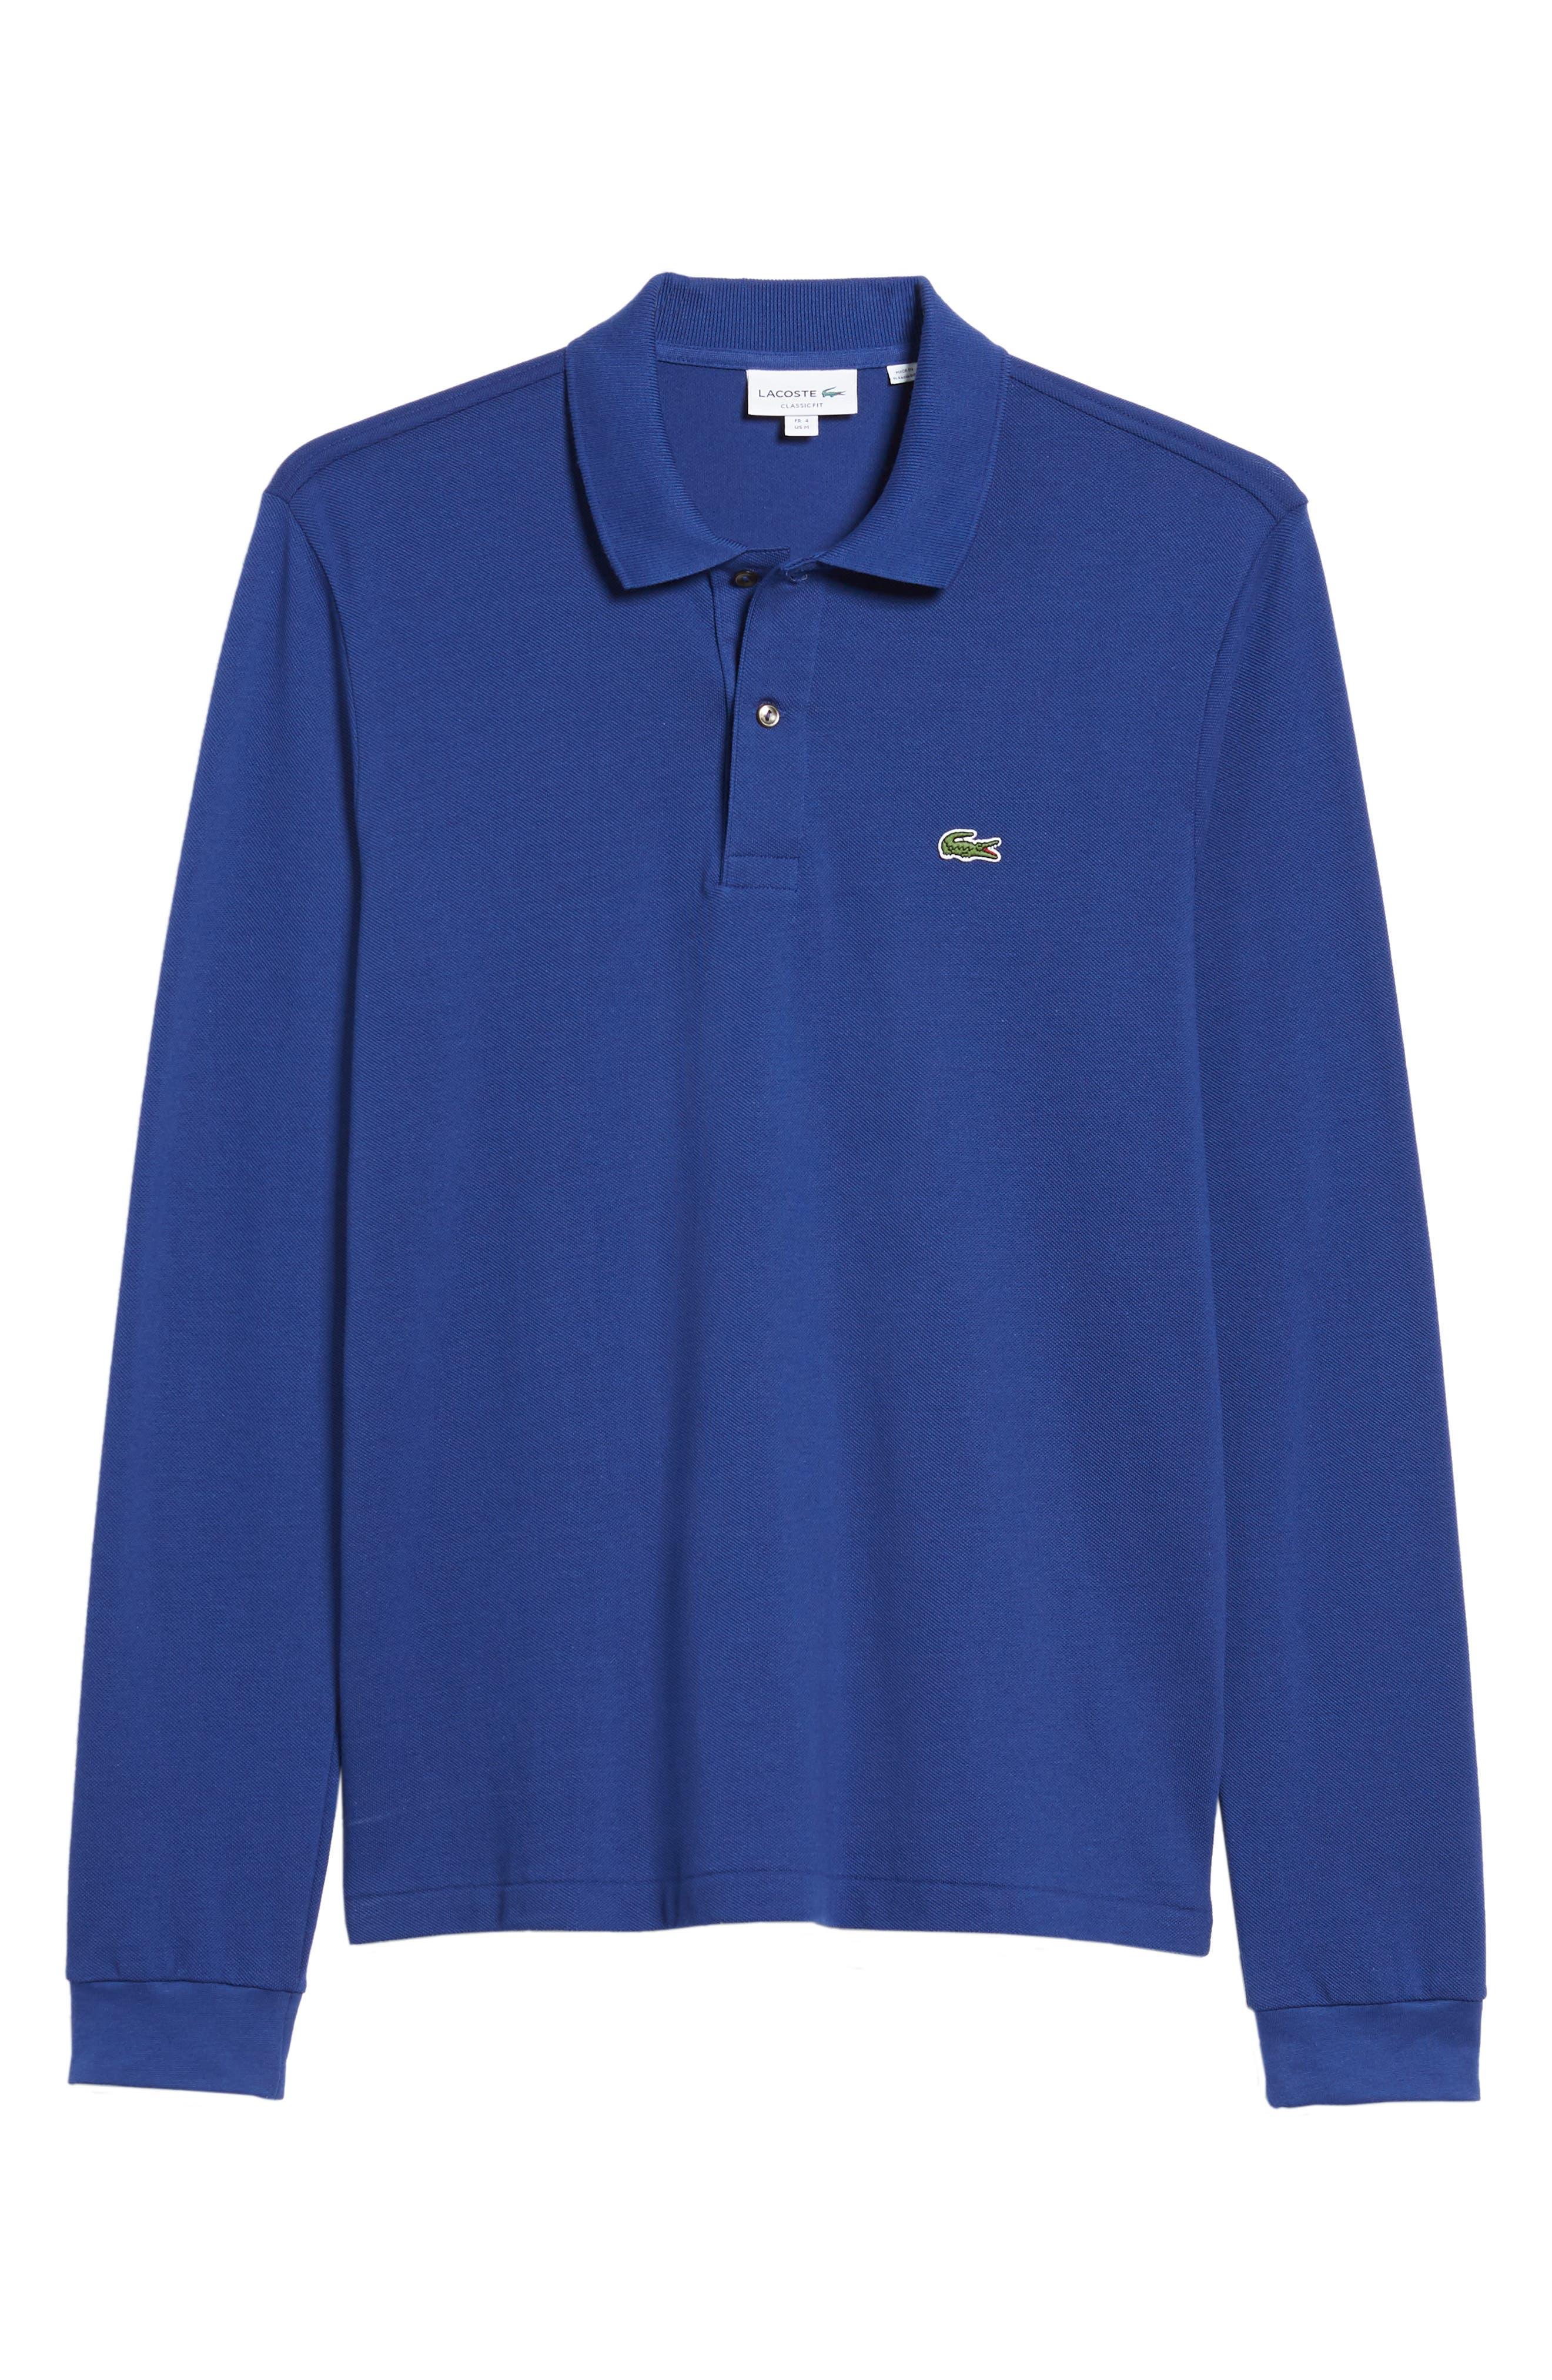 LACOSTE, Classic Fit Long Sleeve Piqué Polo, Alternate thumbnail 6, color, OCEAN